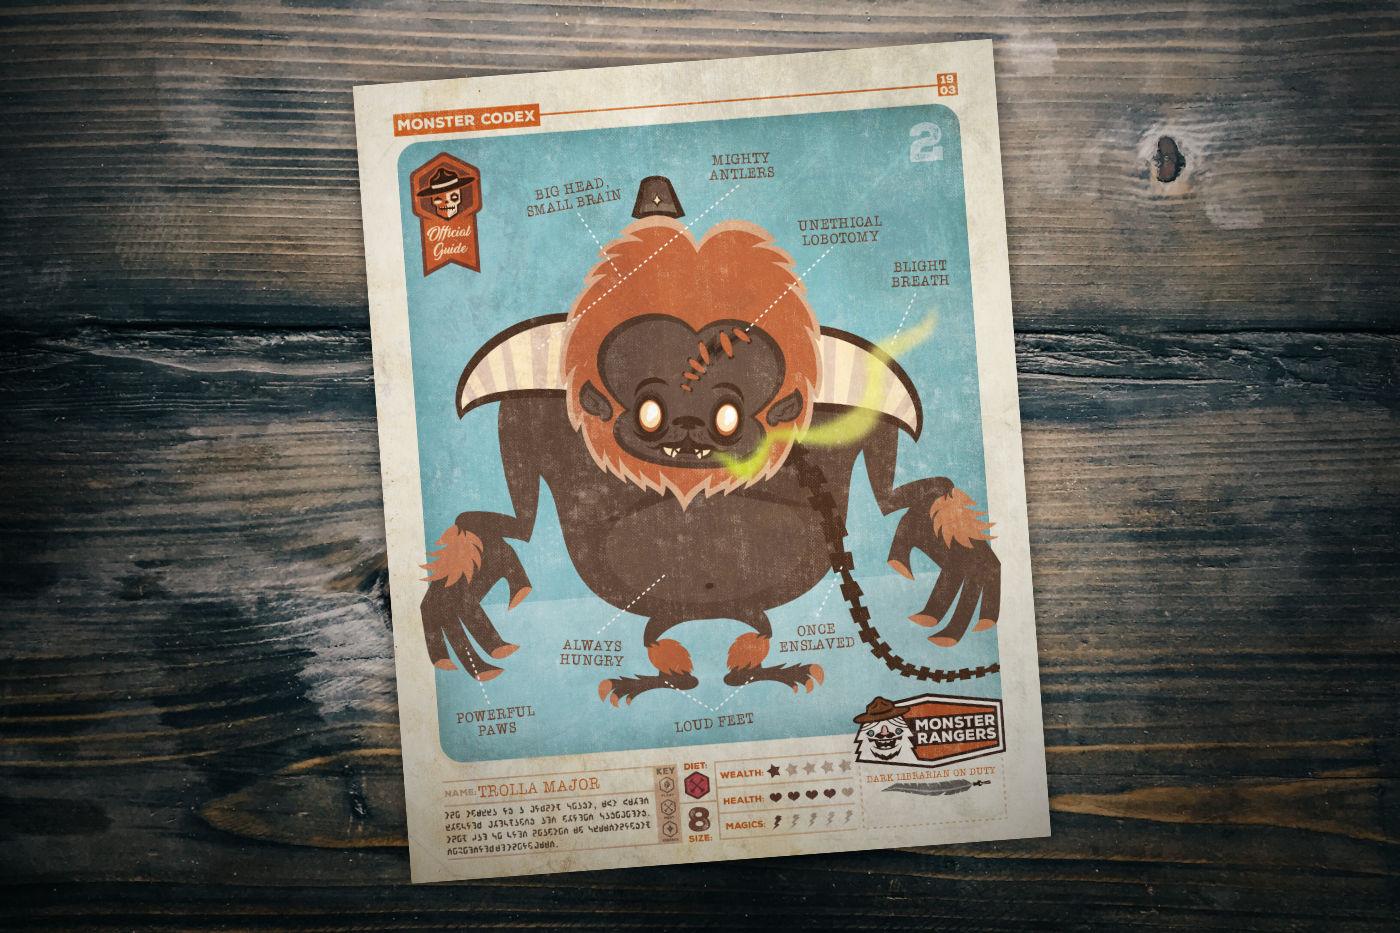 Monster Codex Trolla